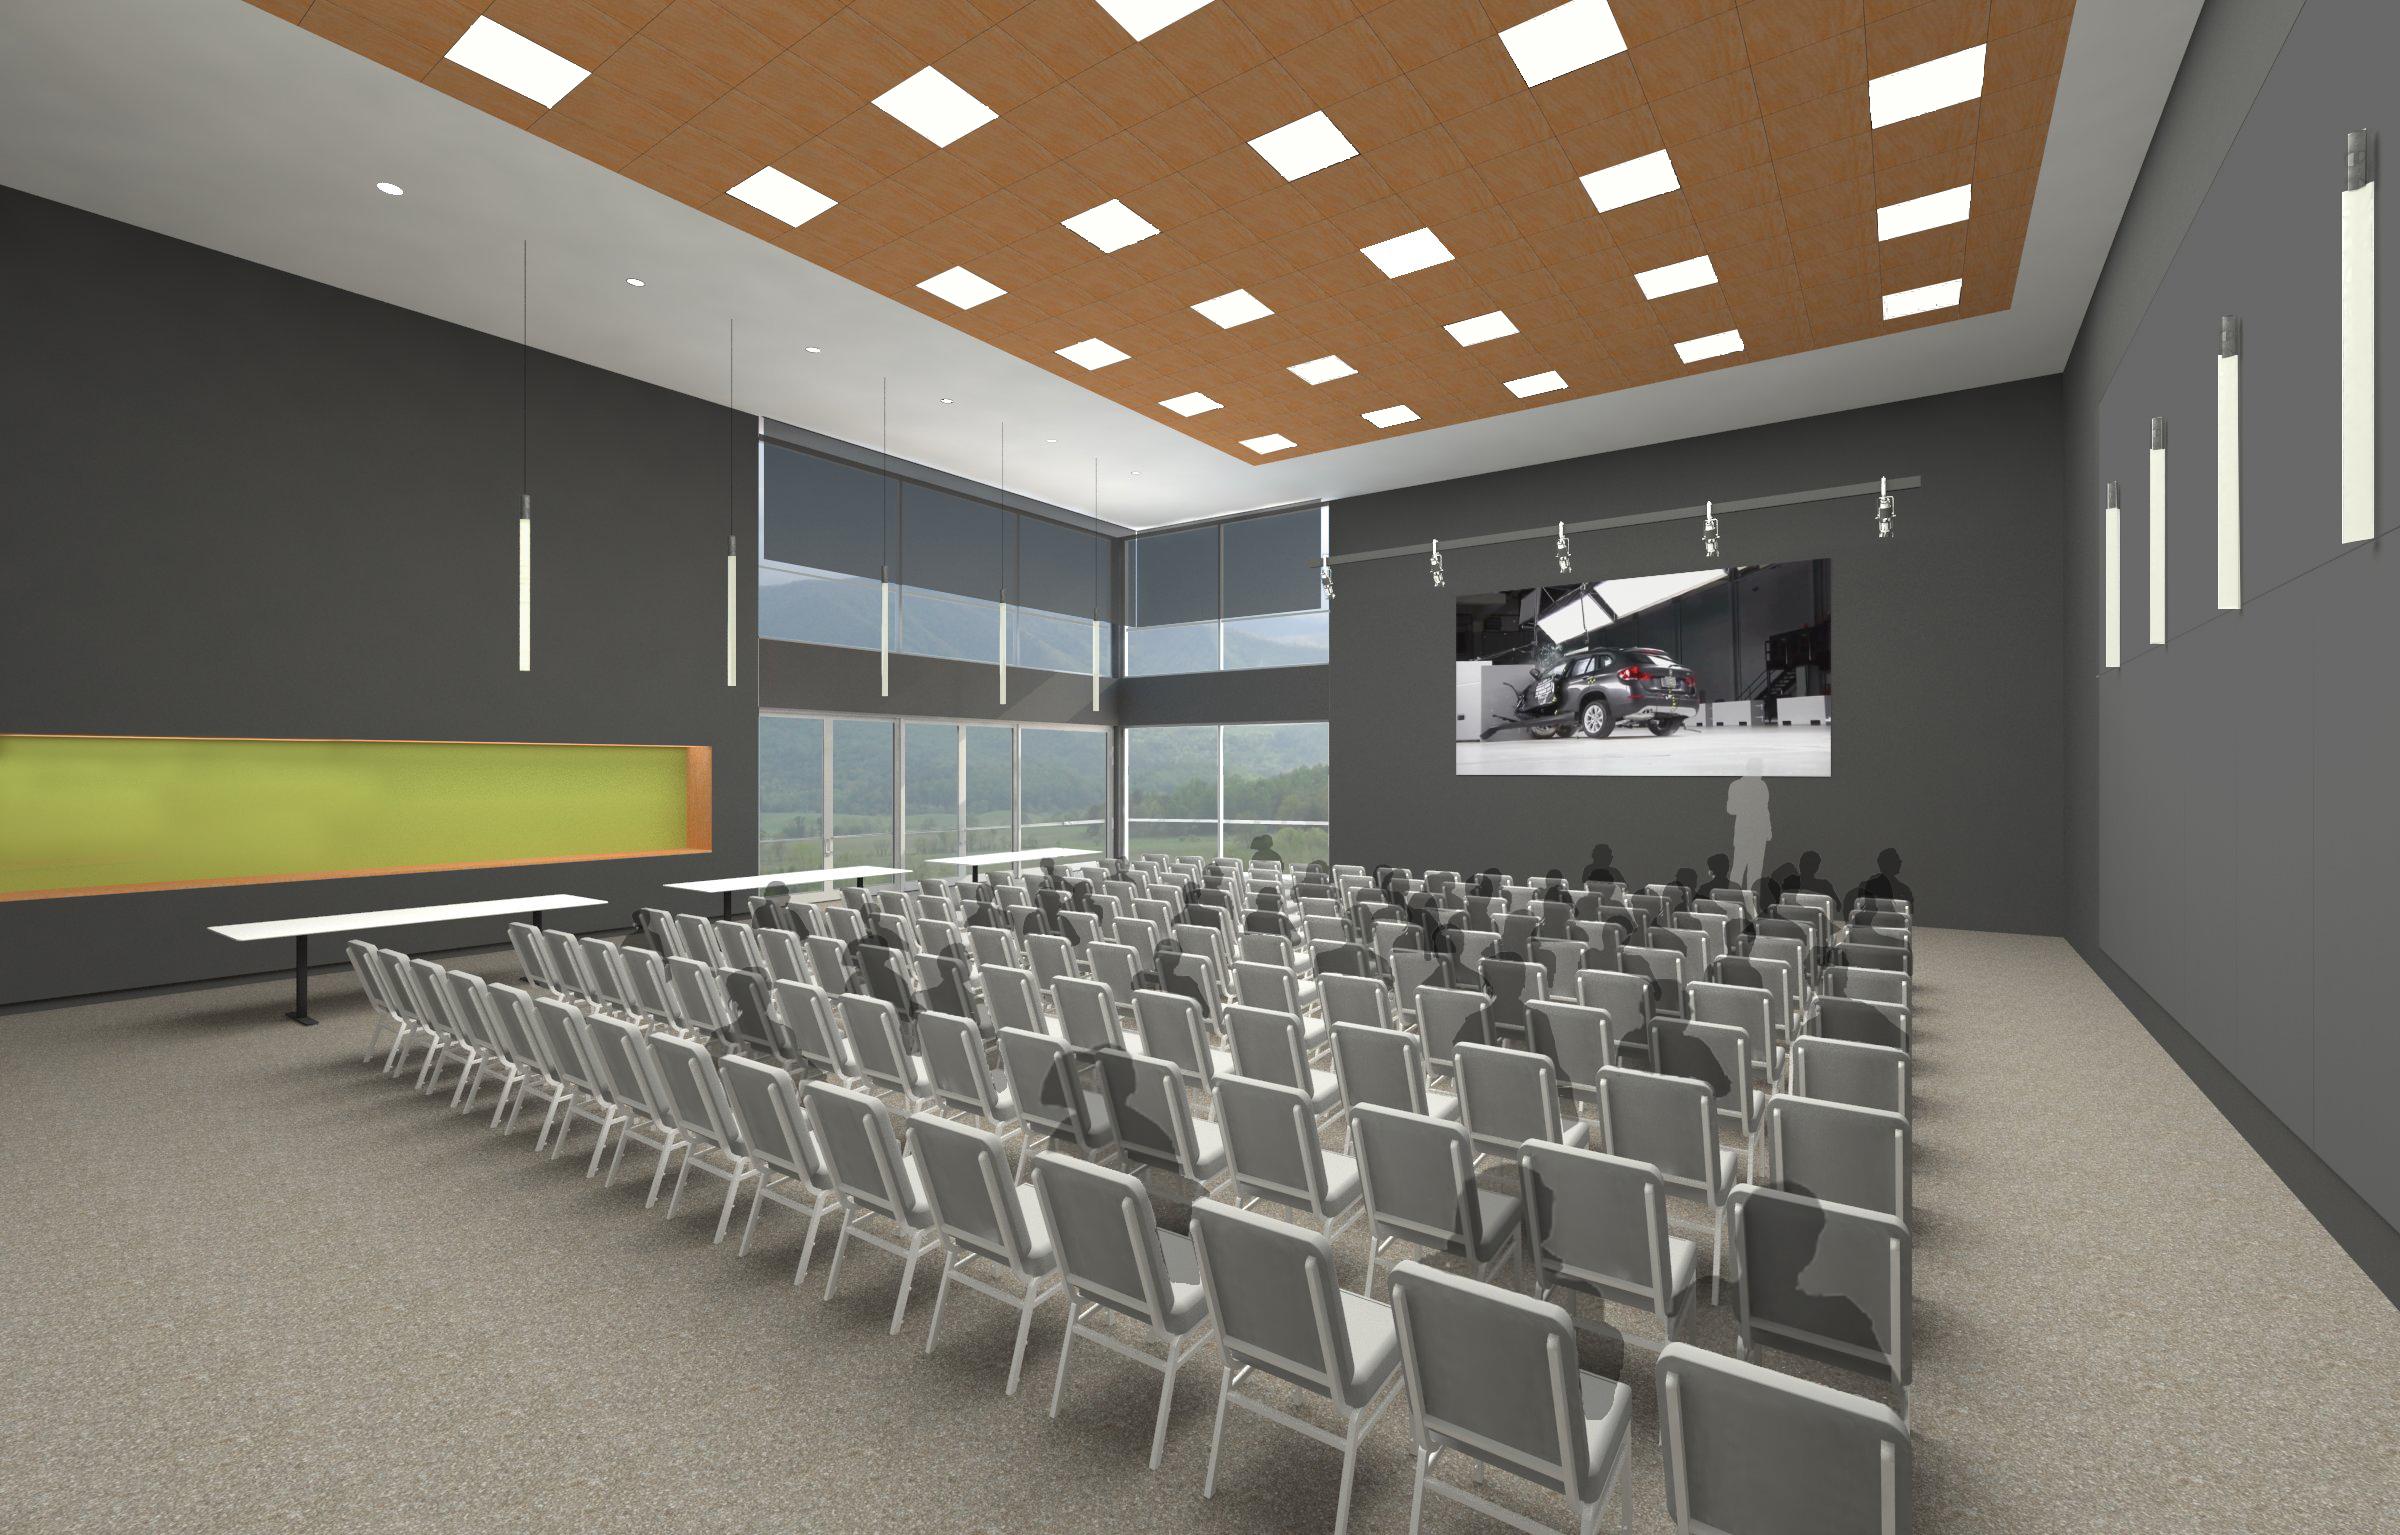 1219 - Conference Room Interior.jpg